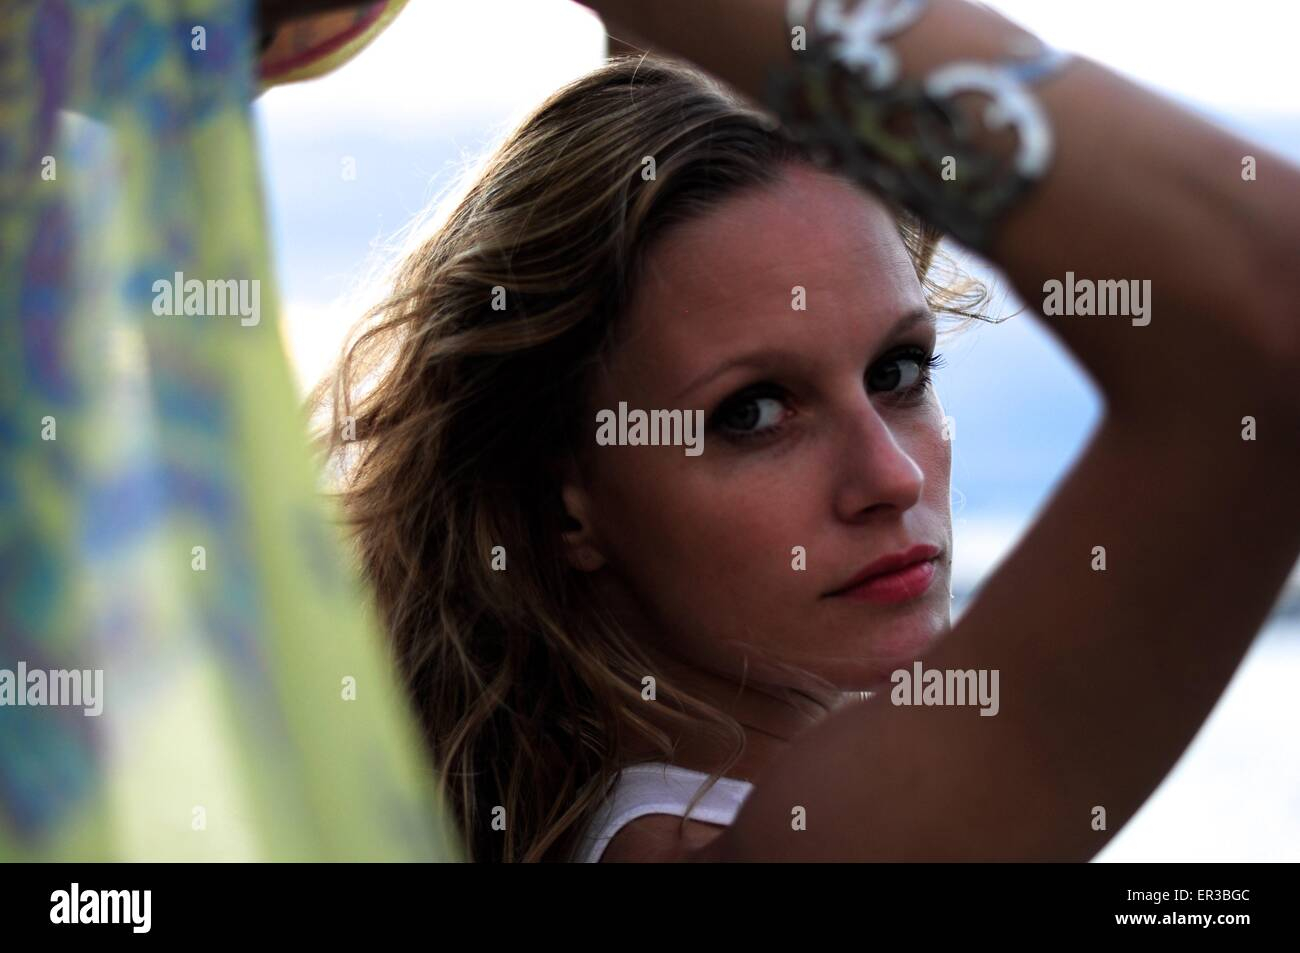 Woman looking over her shoulder - Stock Image